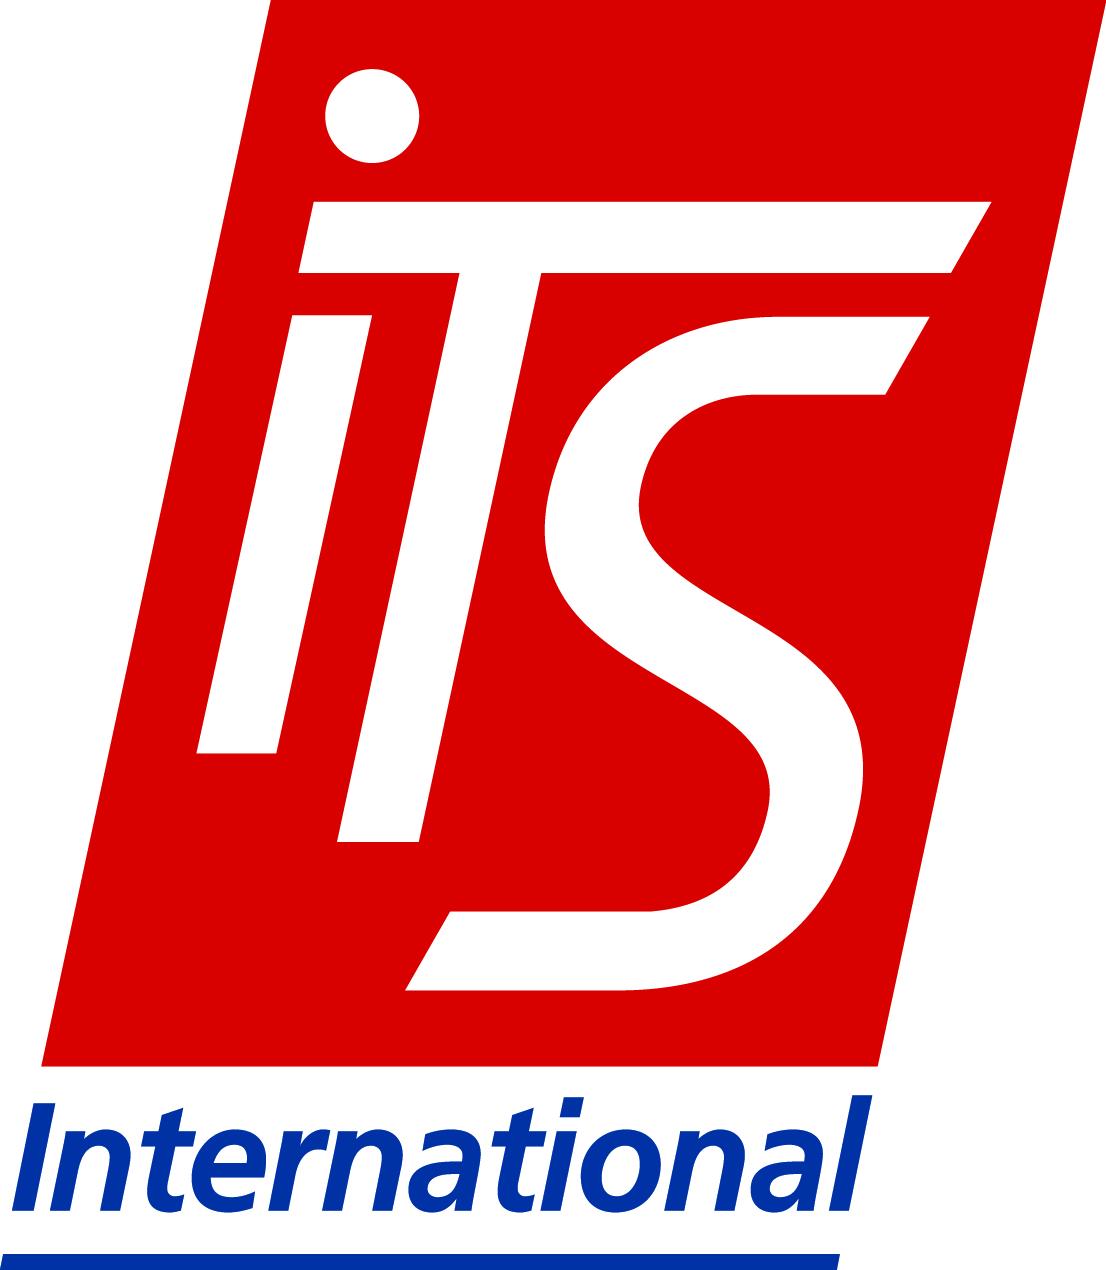 ITS-500dpi-JPG.jpg